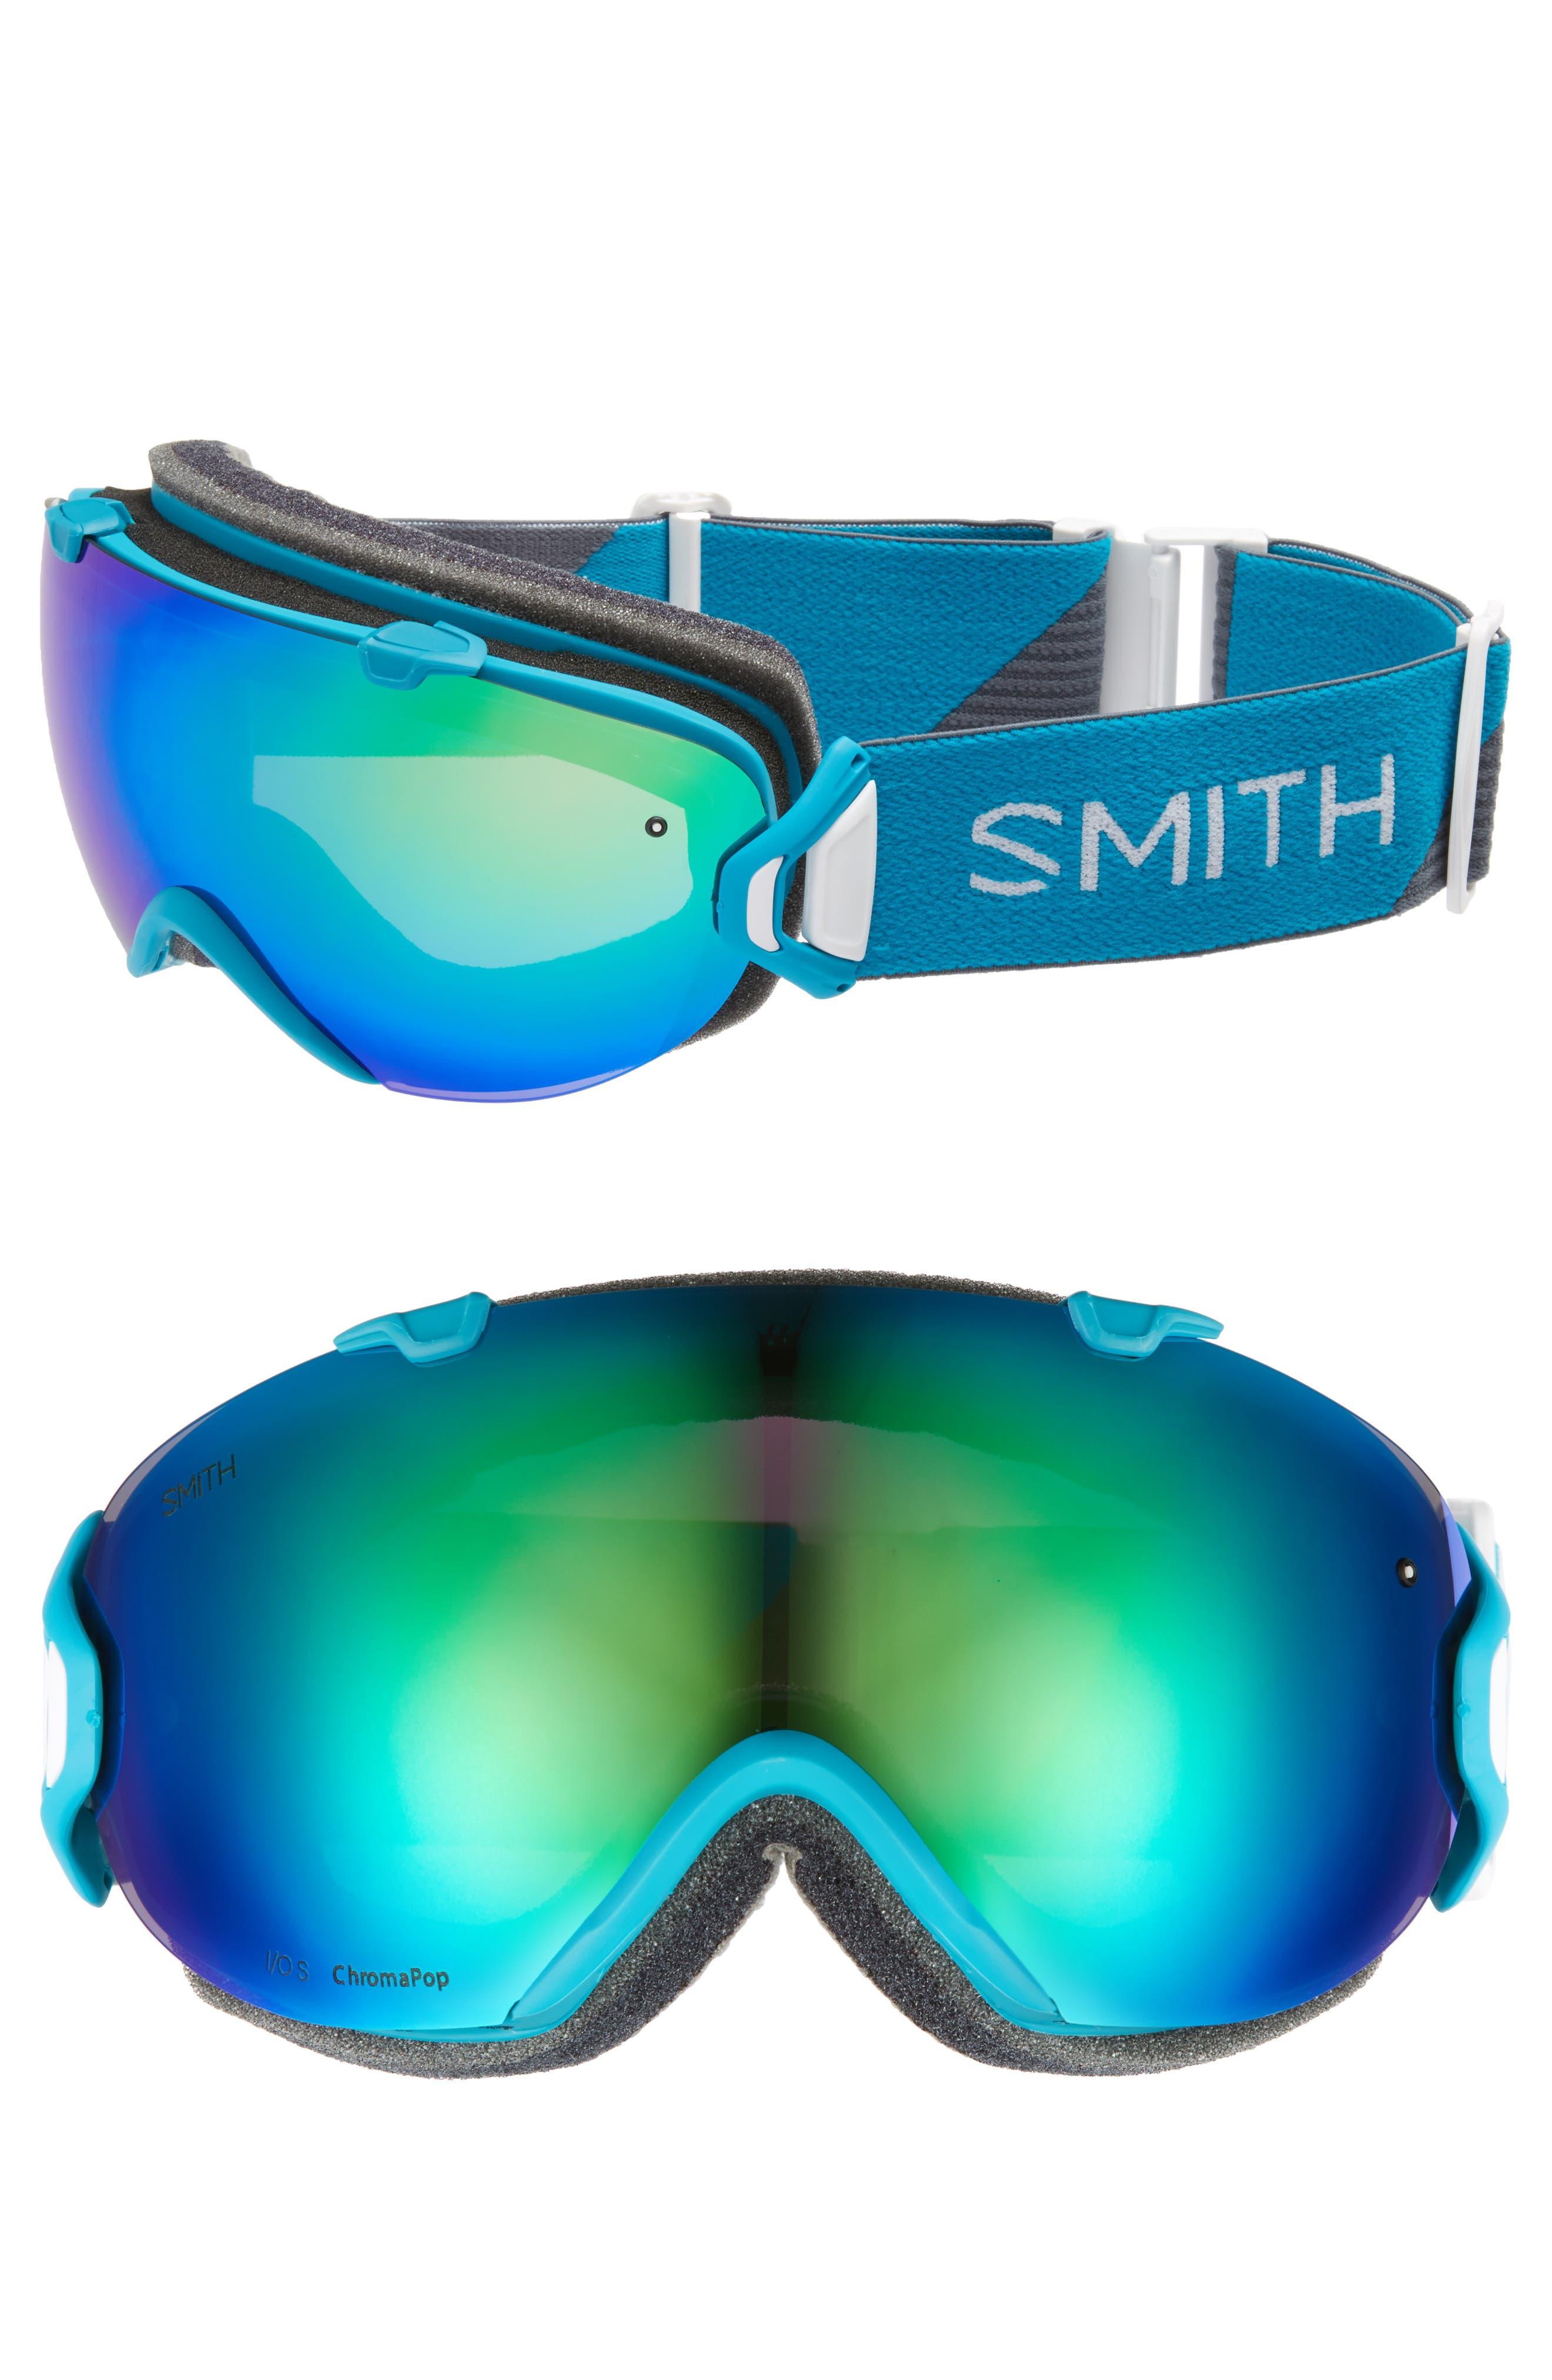 Main Image - Smith I/OS ChromaPop Snow Goggles